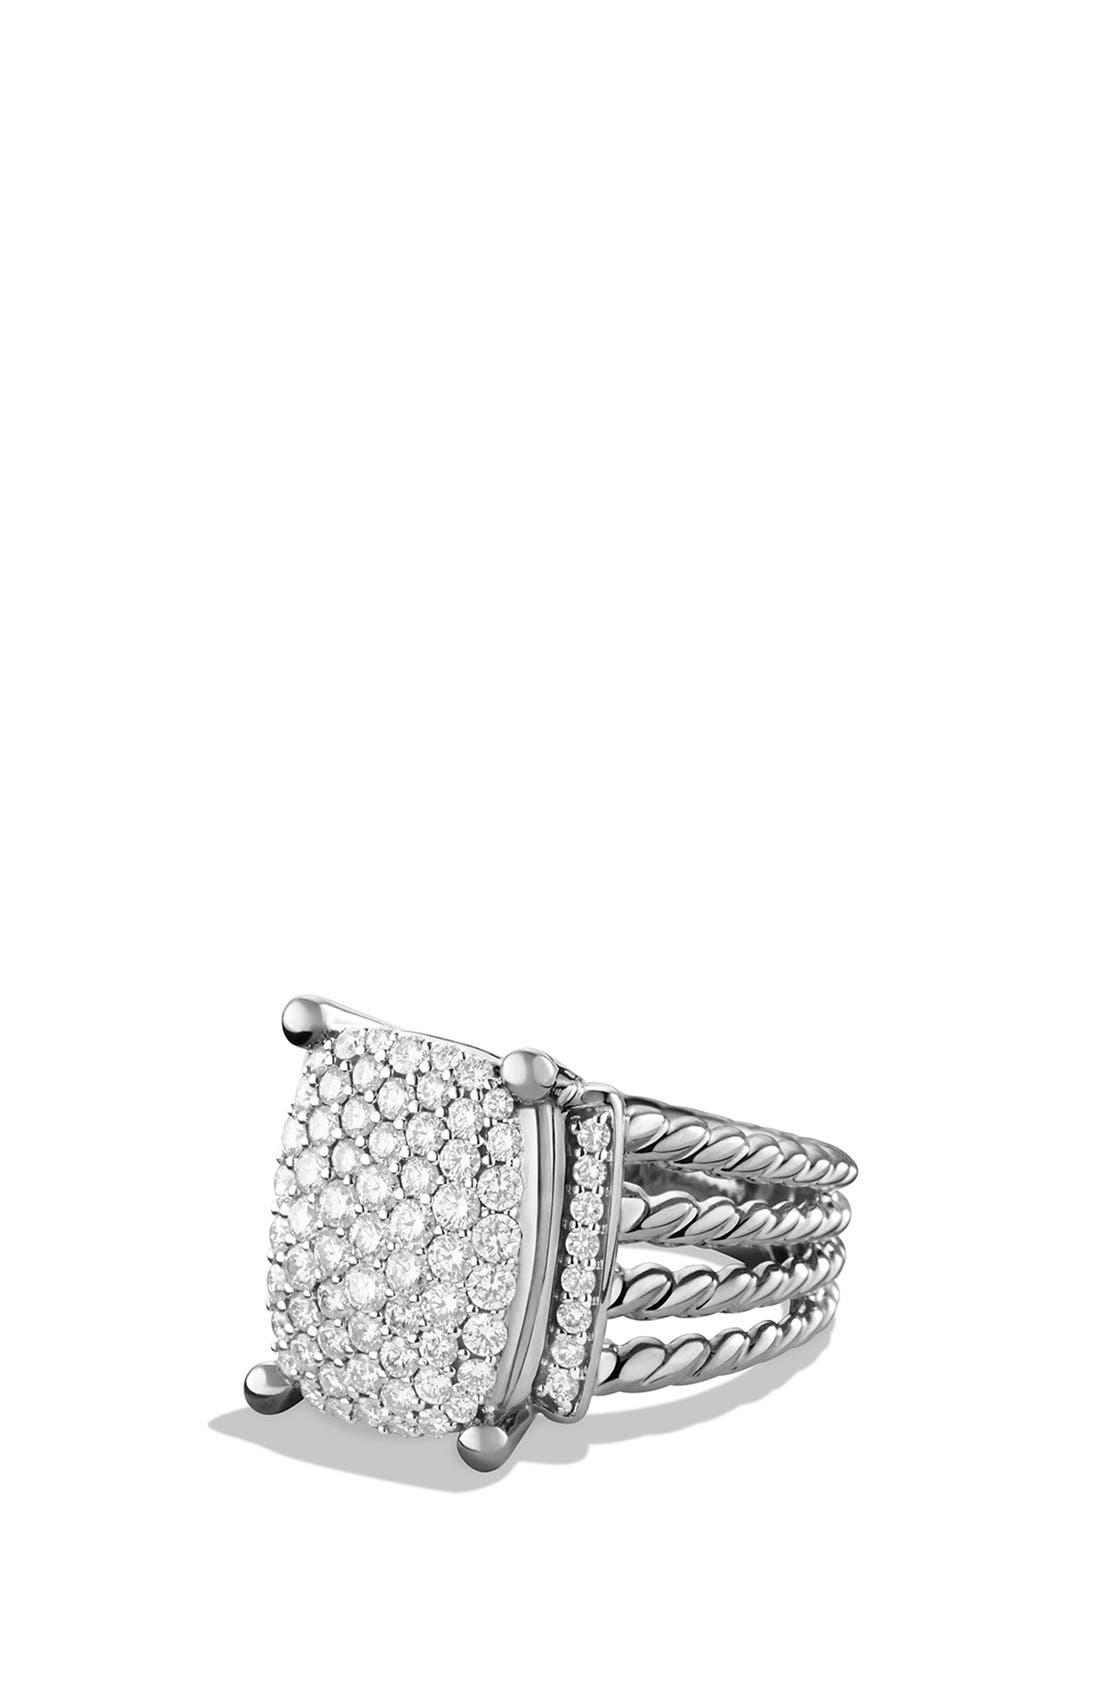 Alternate Image 1 Selected - David Yurman 'Wheaton' Ring with Diamonds